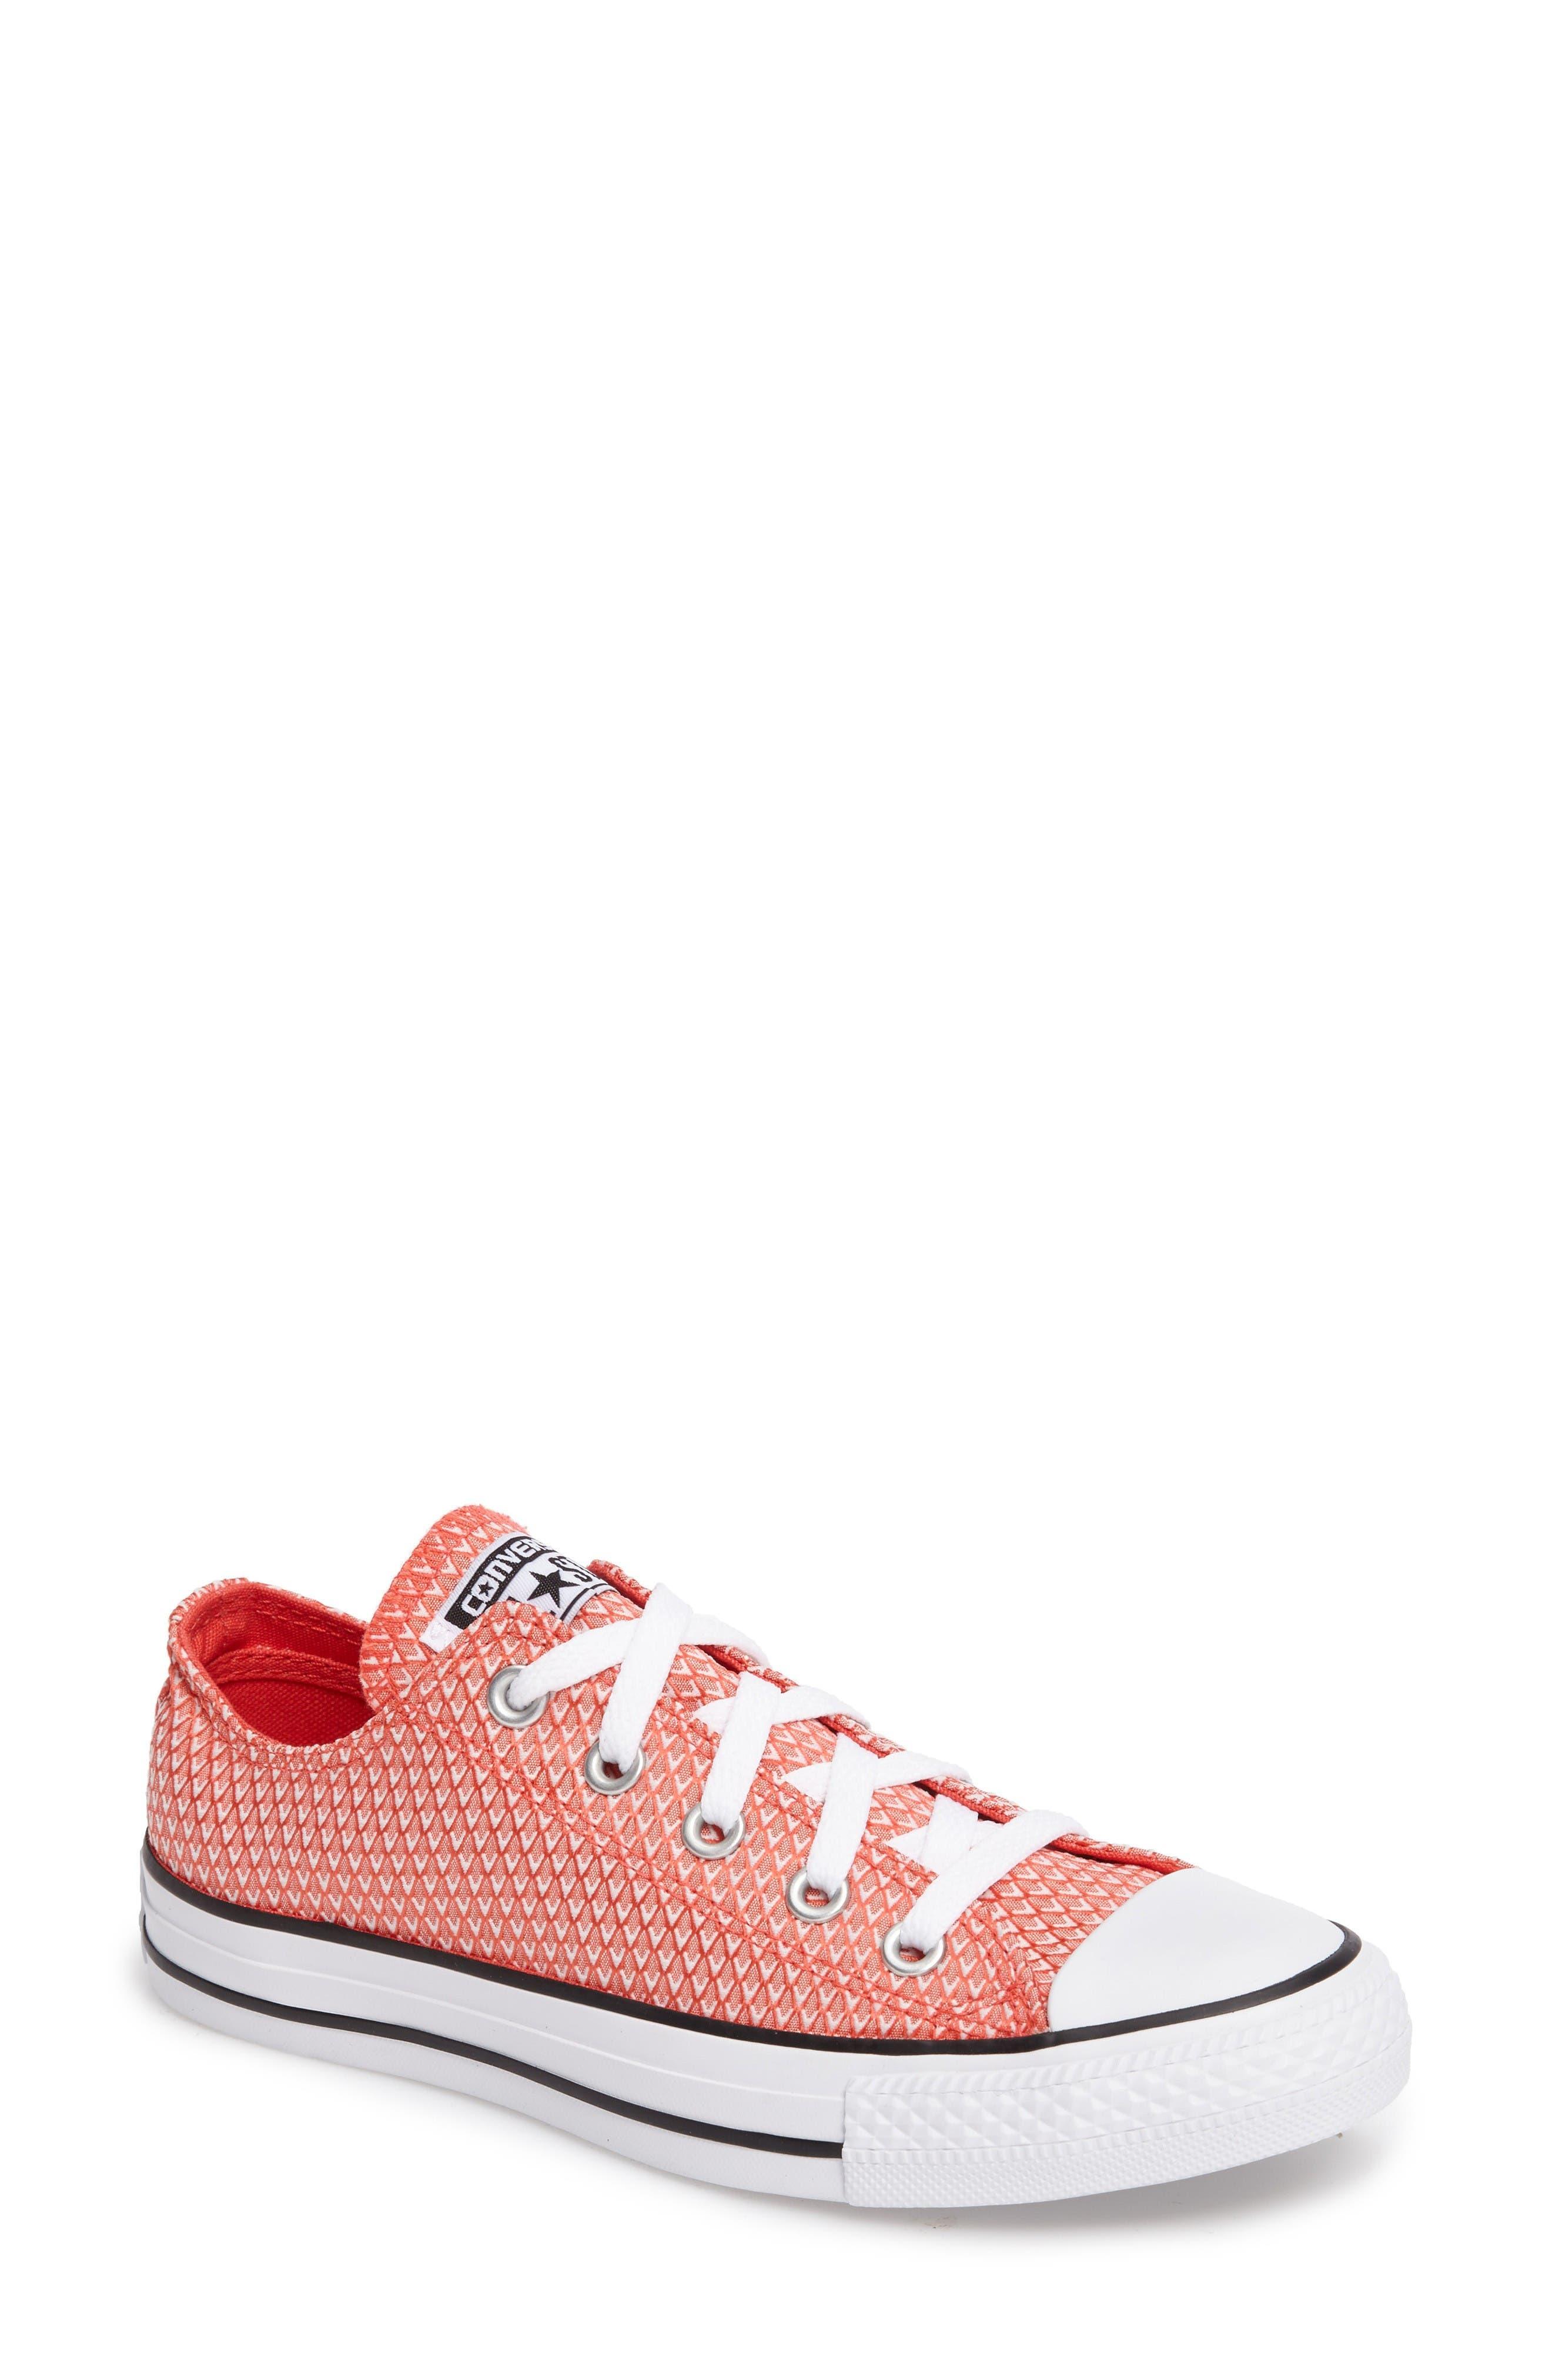 Main Image - Converse Chuck Taylor® All Star® Woven Ox Sneaker (Women)